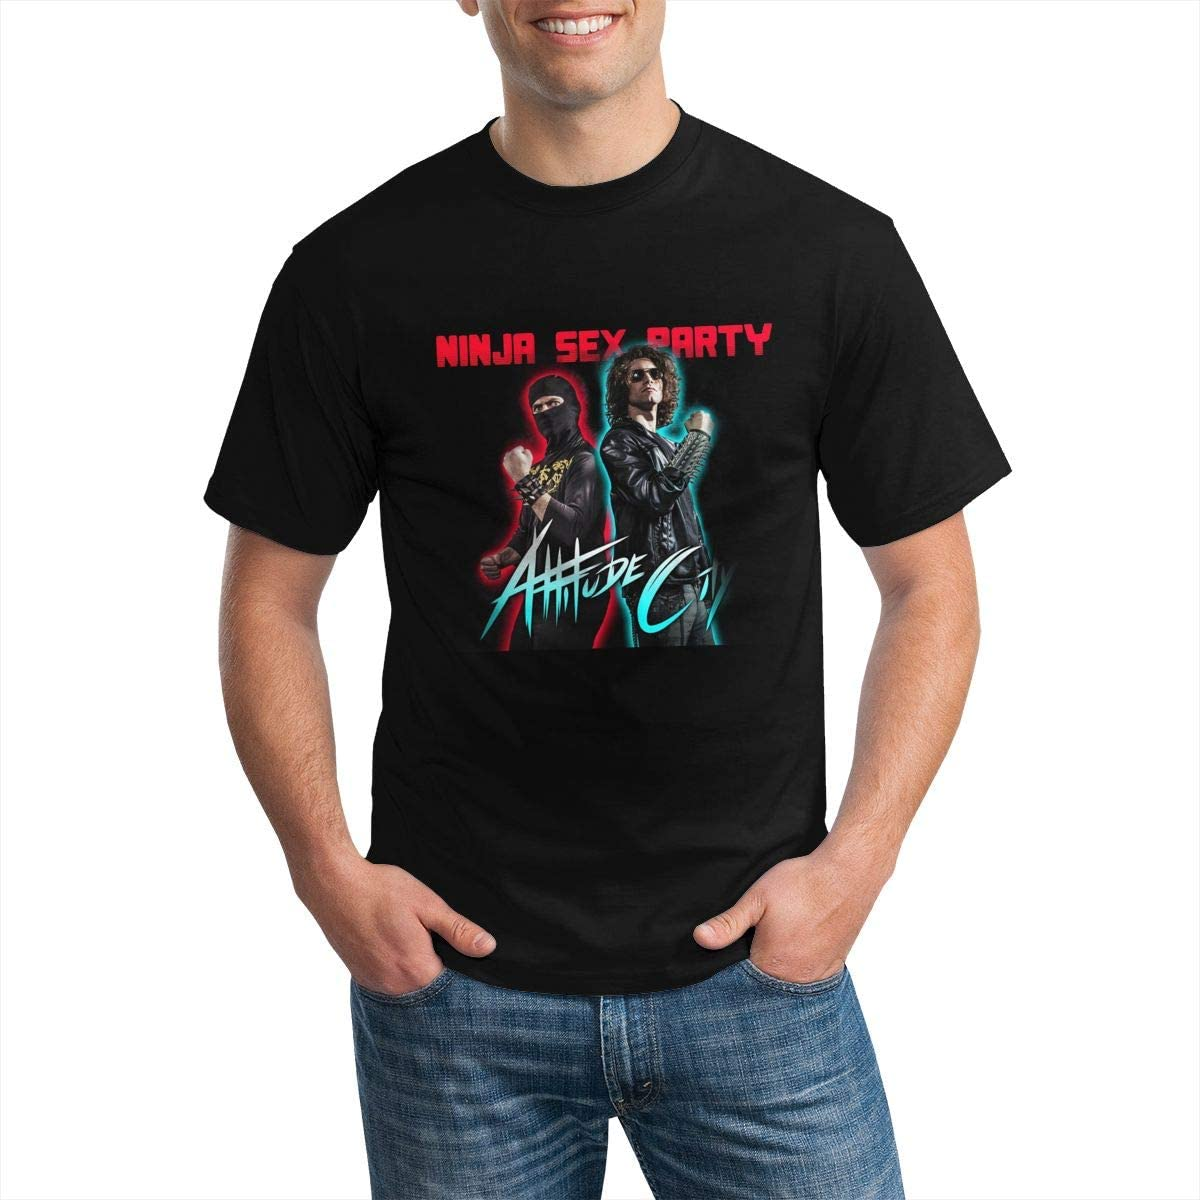 Ninja Sex Party T Shirt Man Comfort Short Sleeves Round Neck Tee